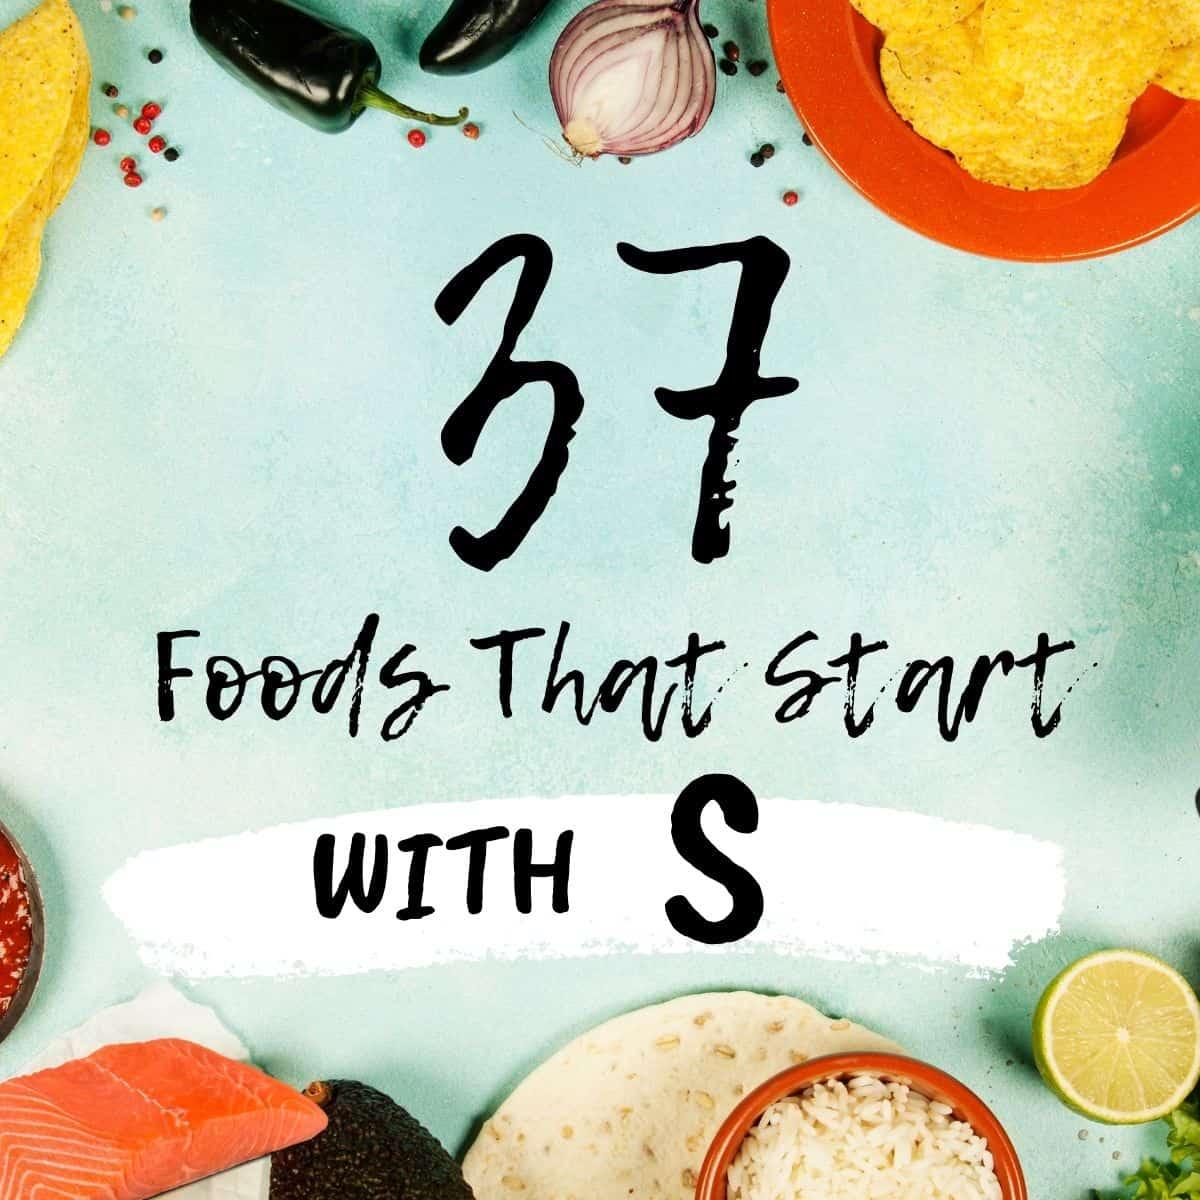 37 Foods That Start With S » Recipefairy.com